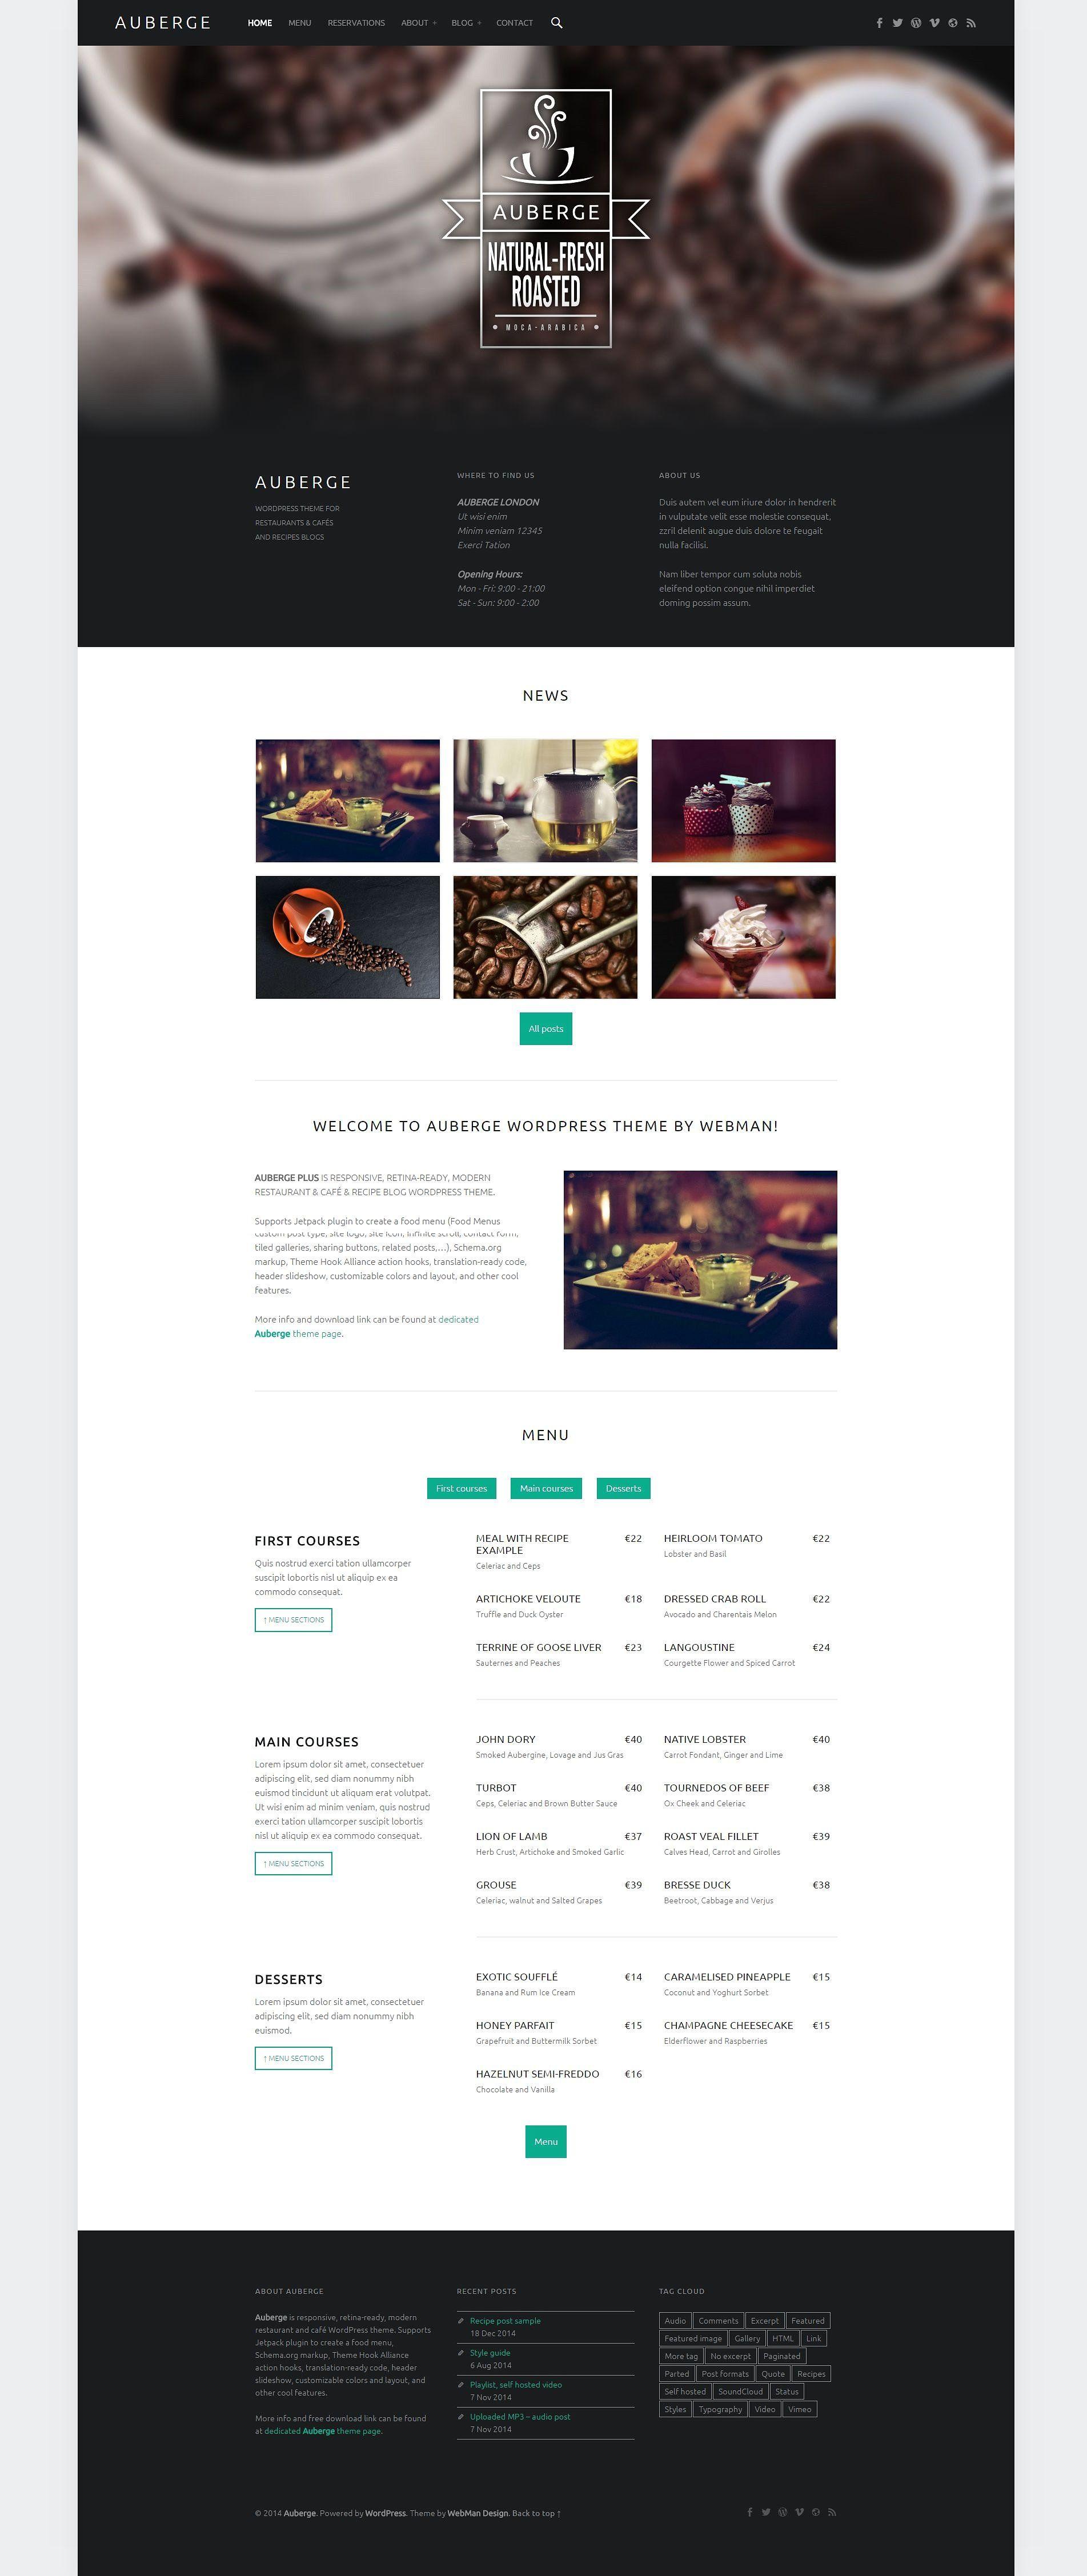 Auberge Plus Wordpress Theme Wordpress Theme Cafe Website